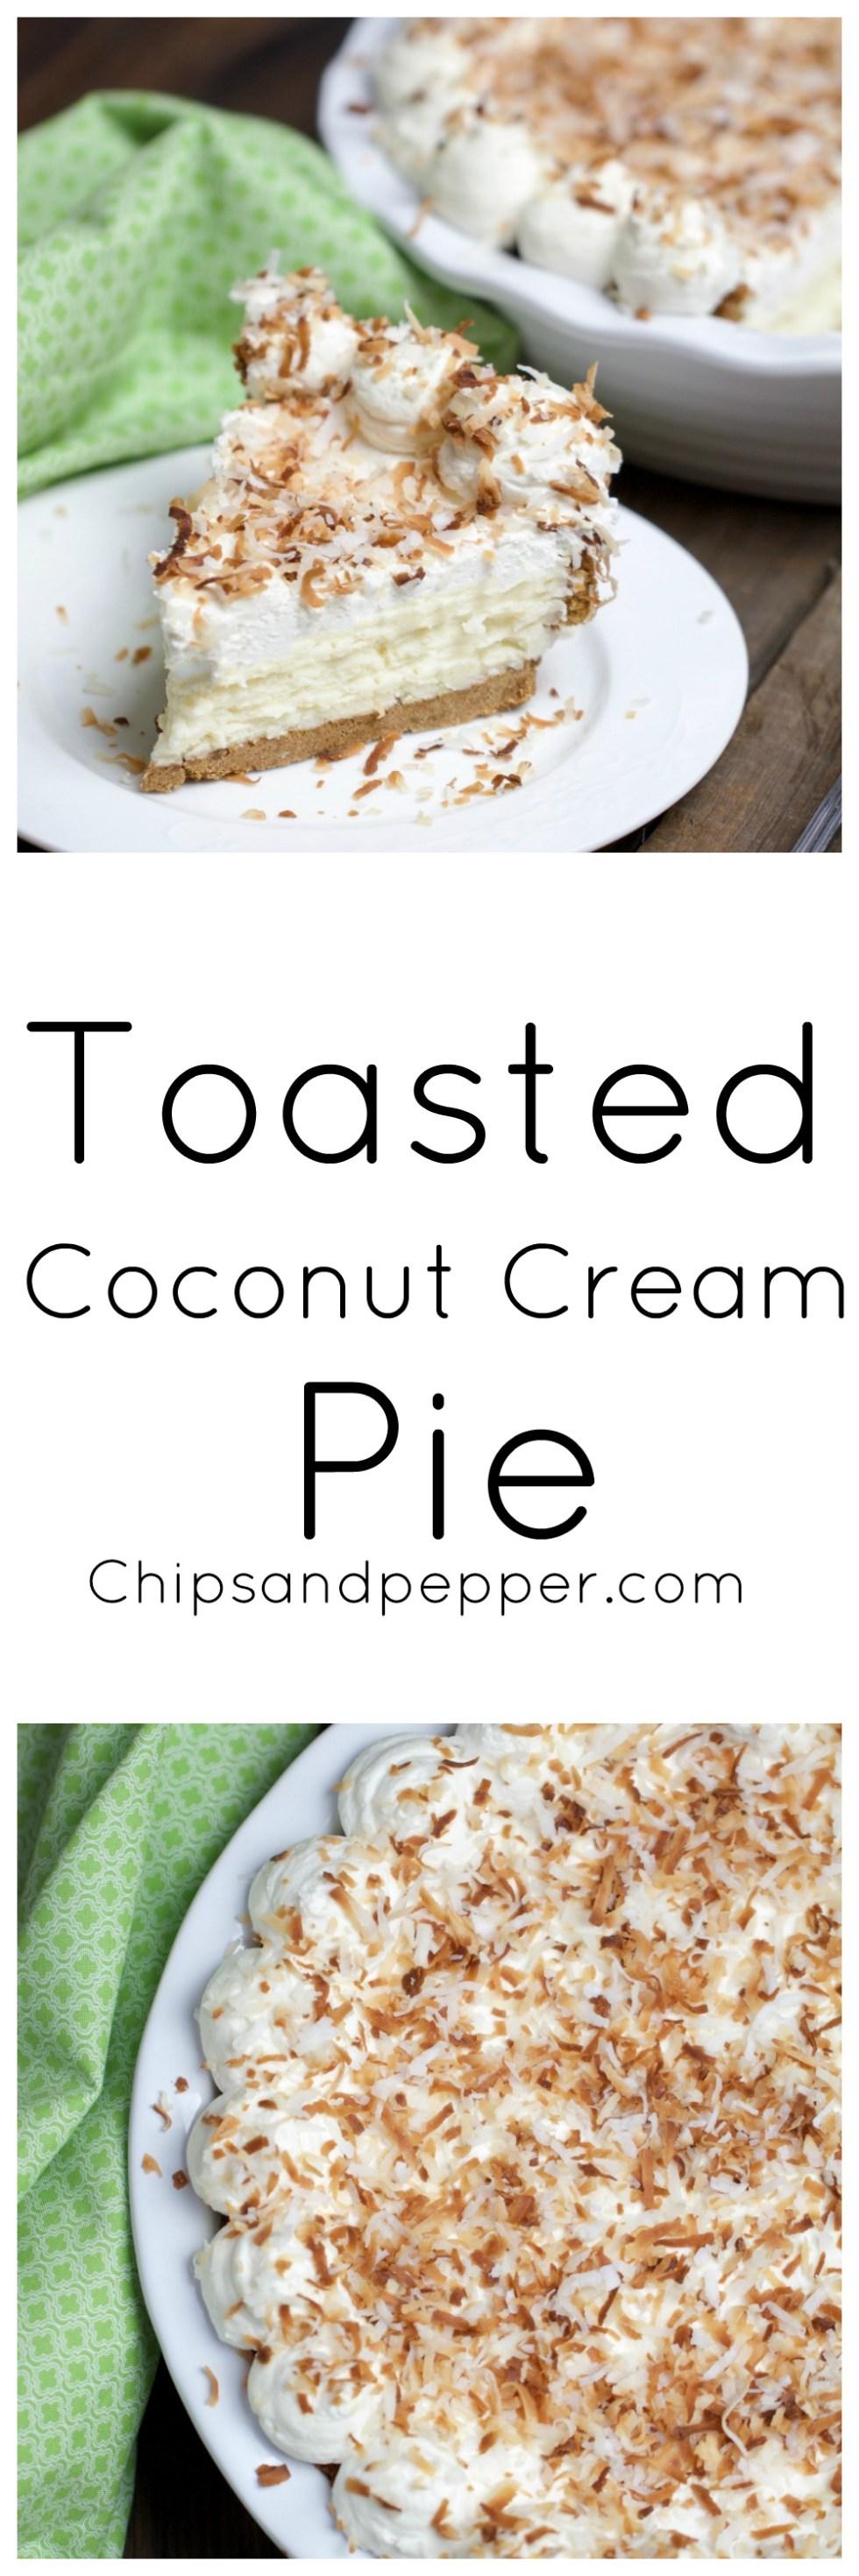 Toasted Coconut Cream Pie - chipsandpepper.com